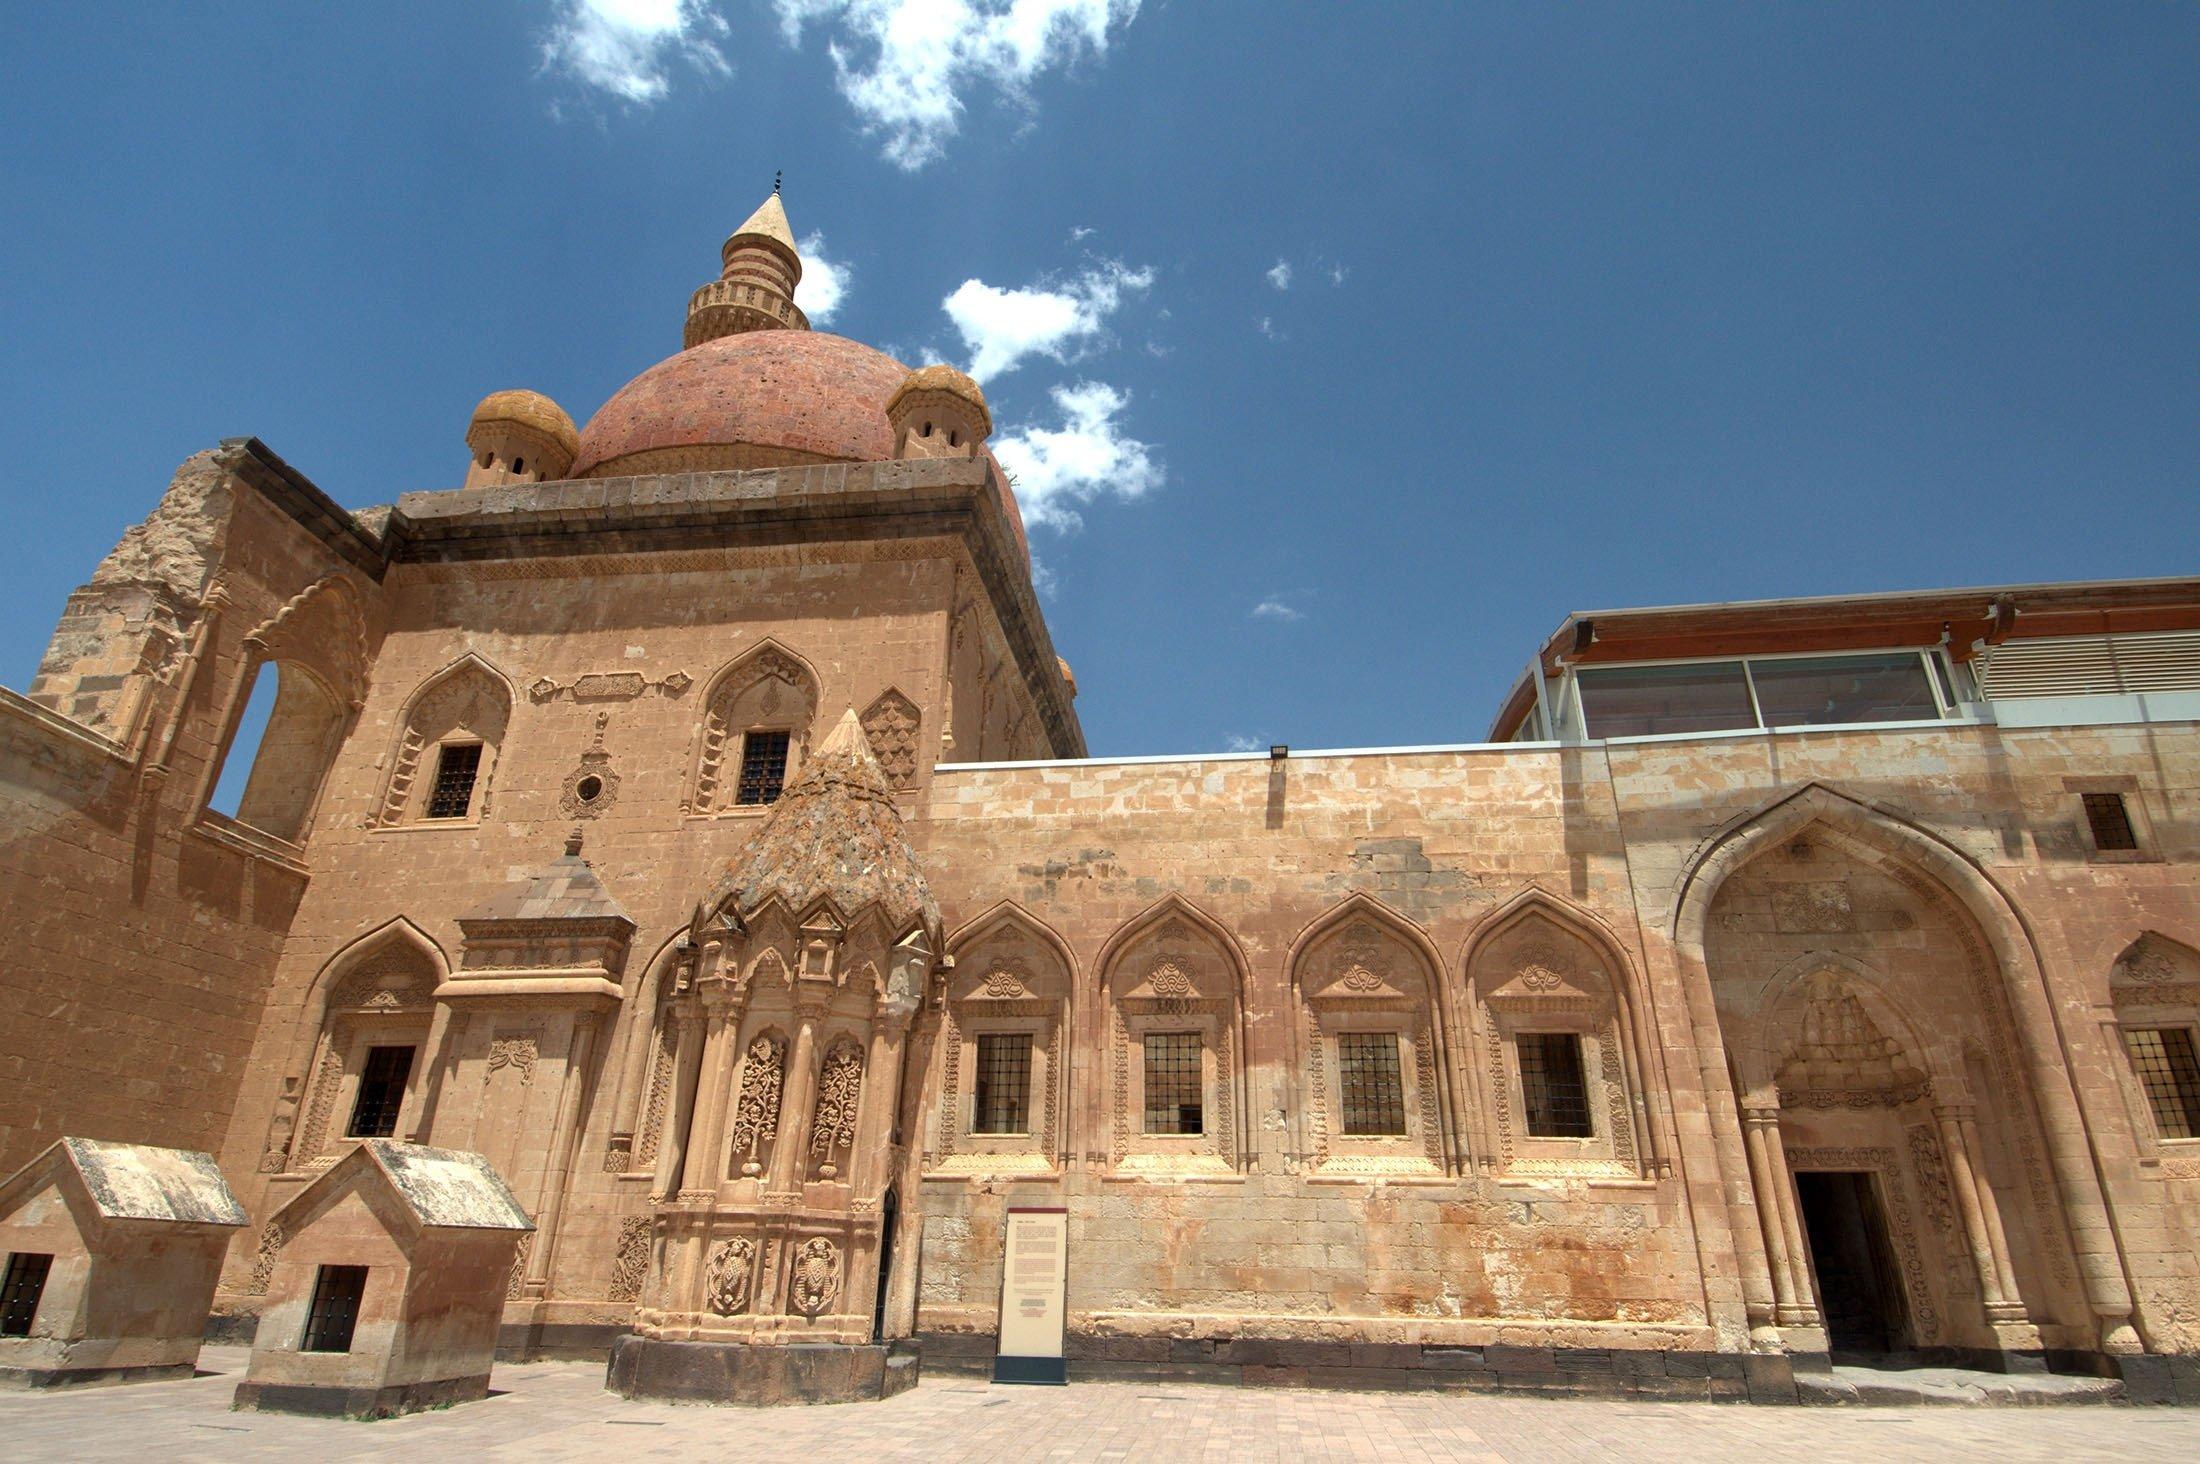 The courtyard of theIshak Pasha Palace can be seen in theDoğubayazıt district of Ağrı, Turkey. (Shutterstock Photo)